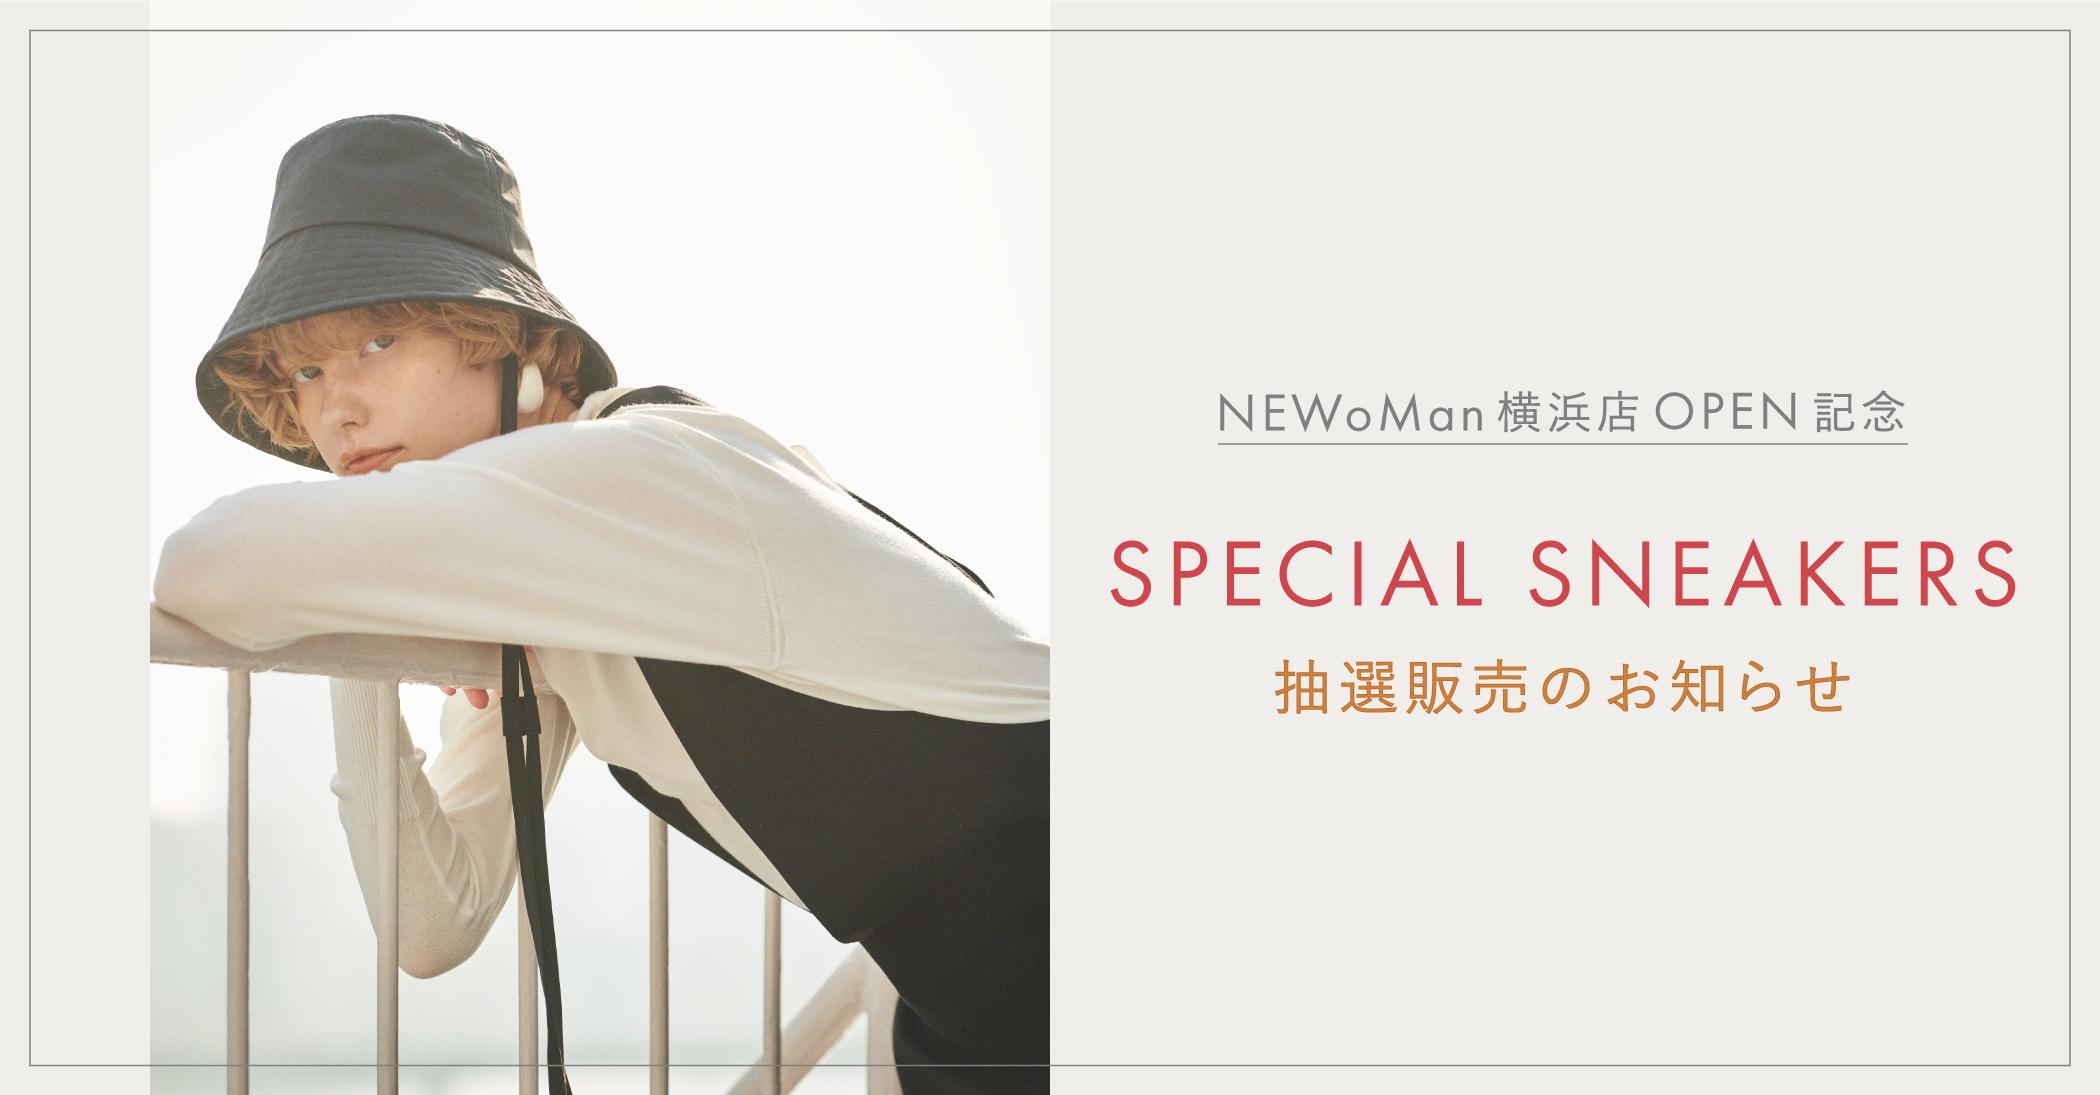 NEWoMan横浜店 OPEN記念 Special Sneaker抽選販売のお知らせ